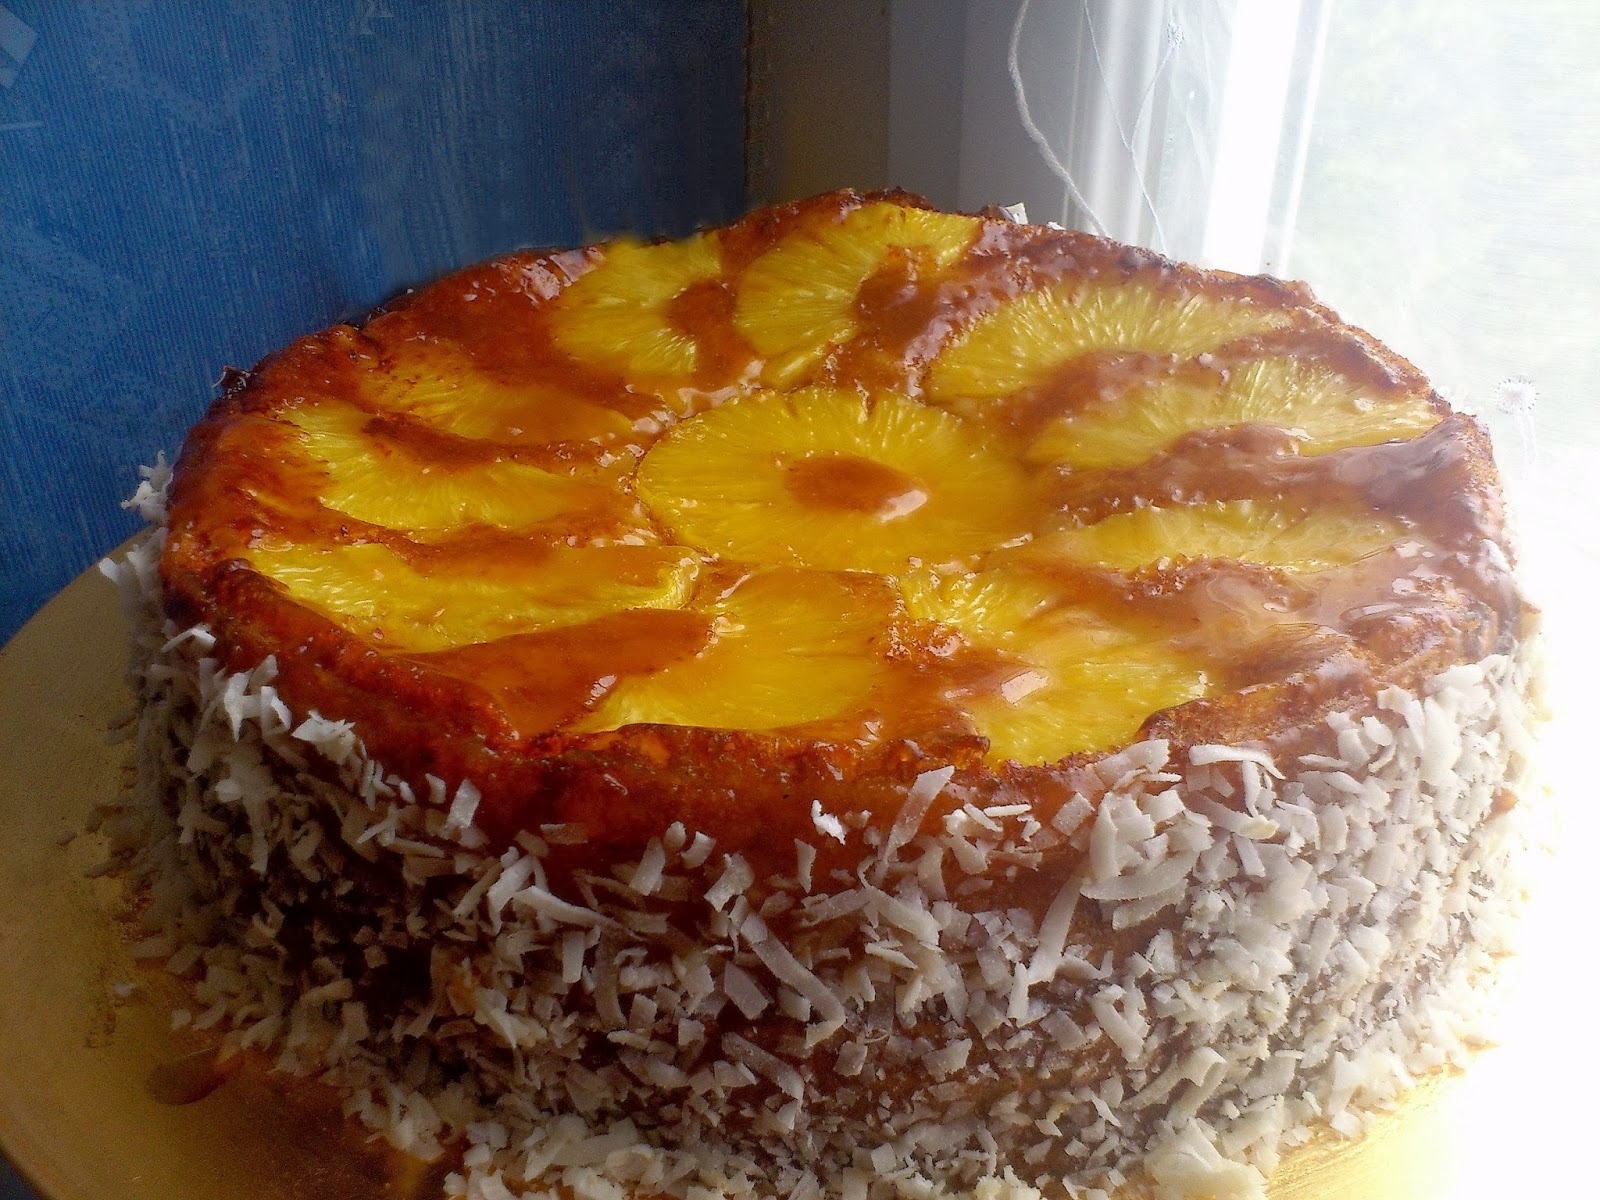 Gateau ananas en boite sans beurre